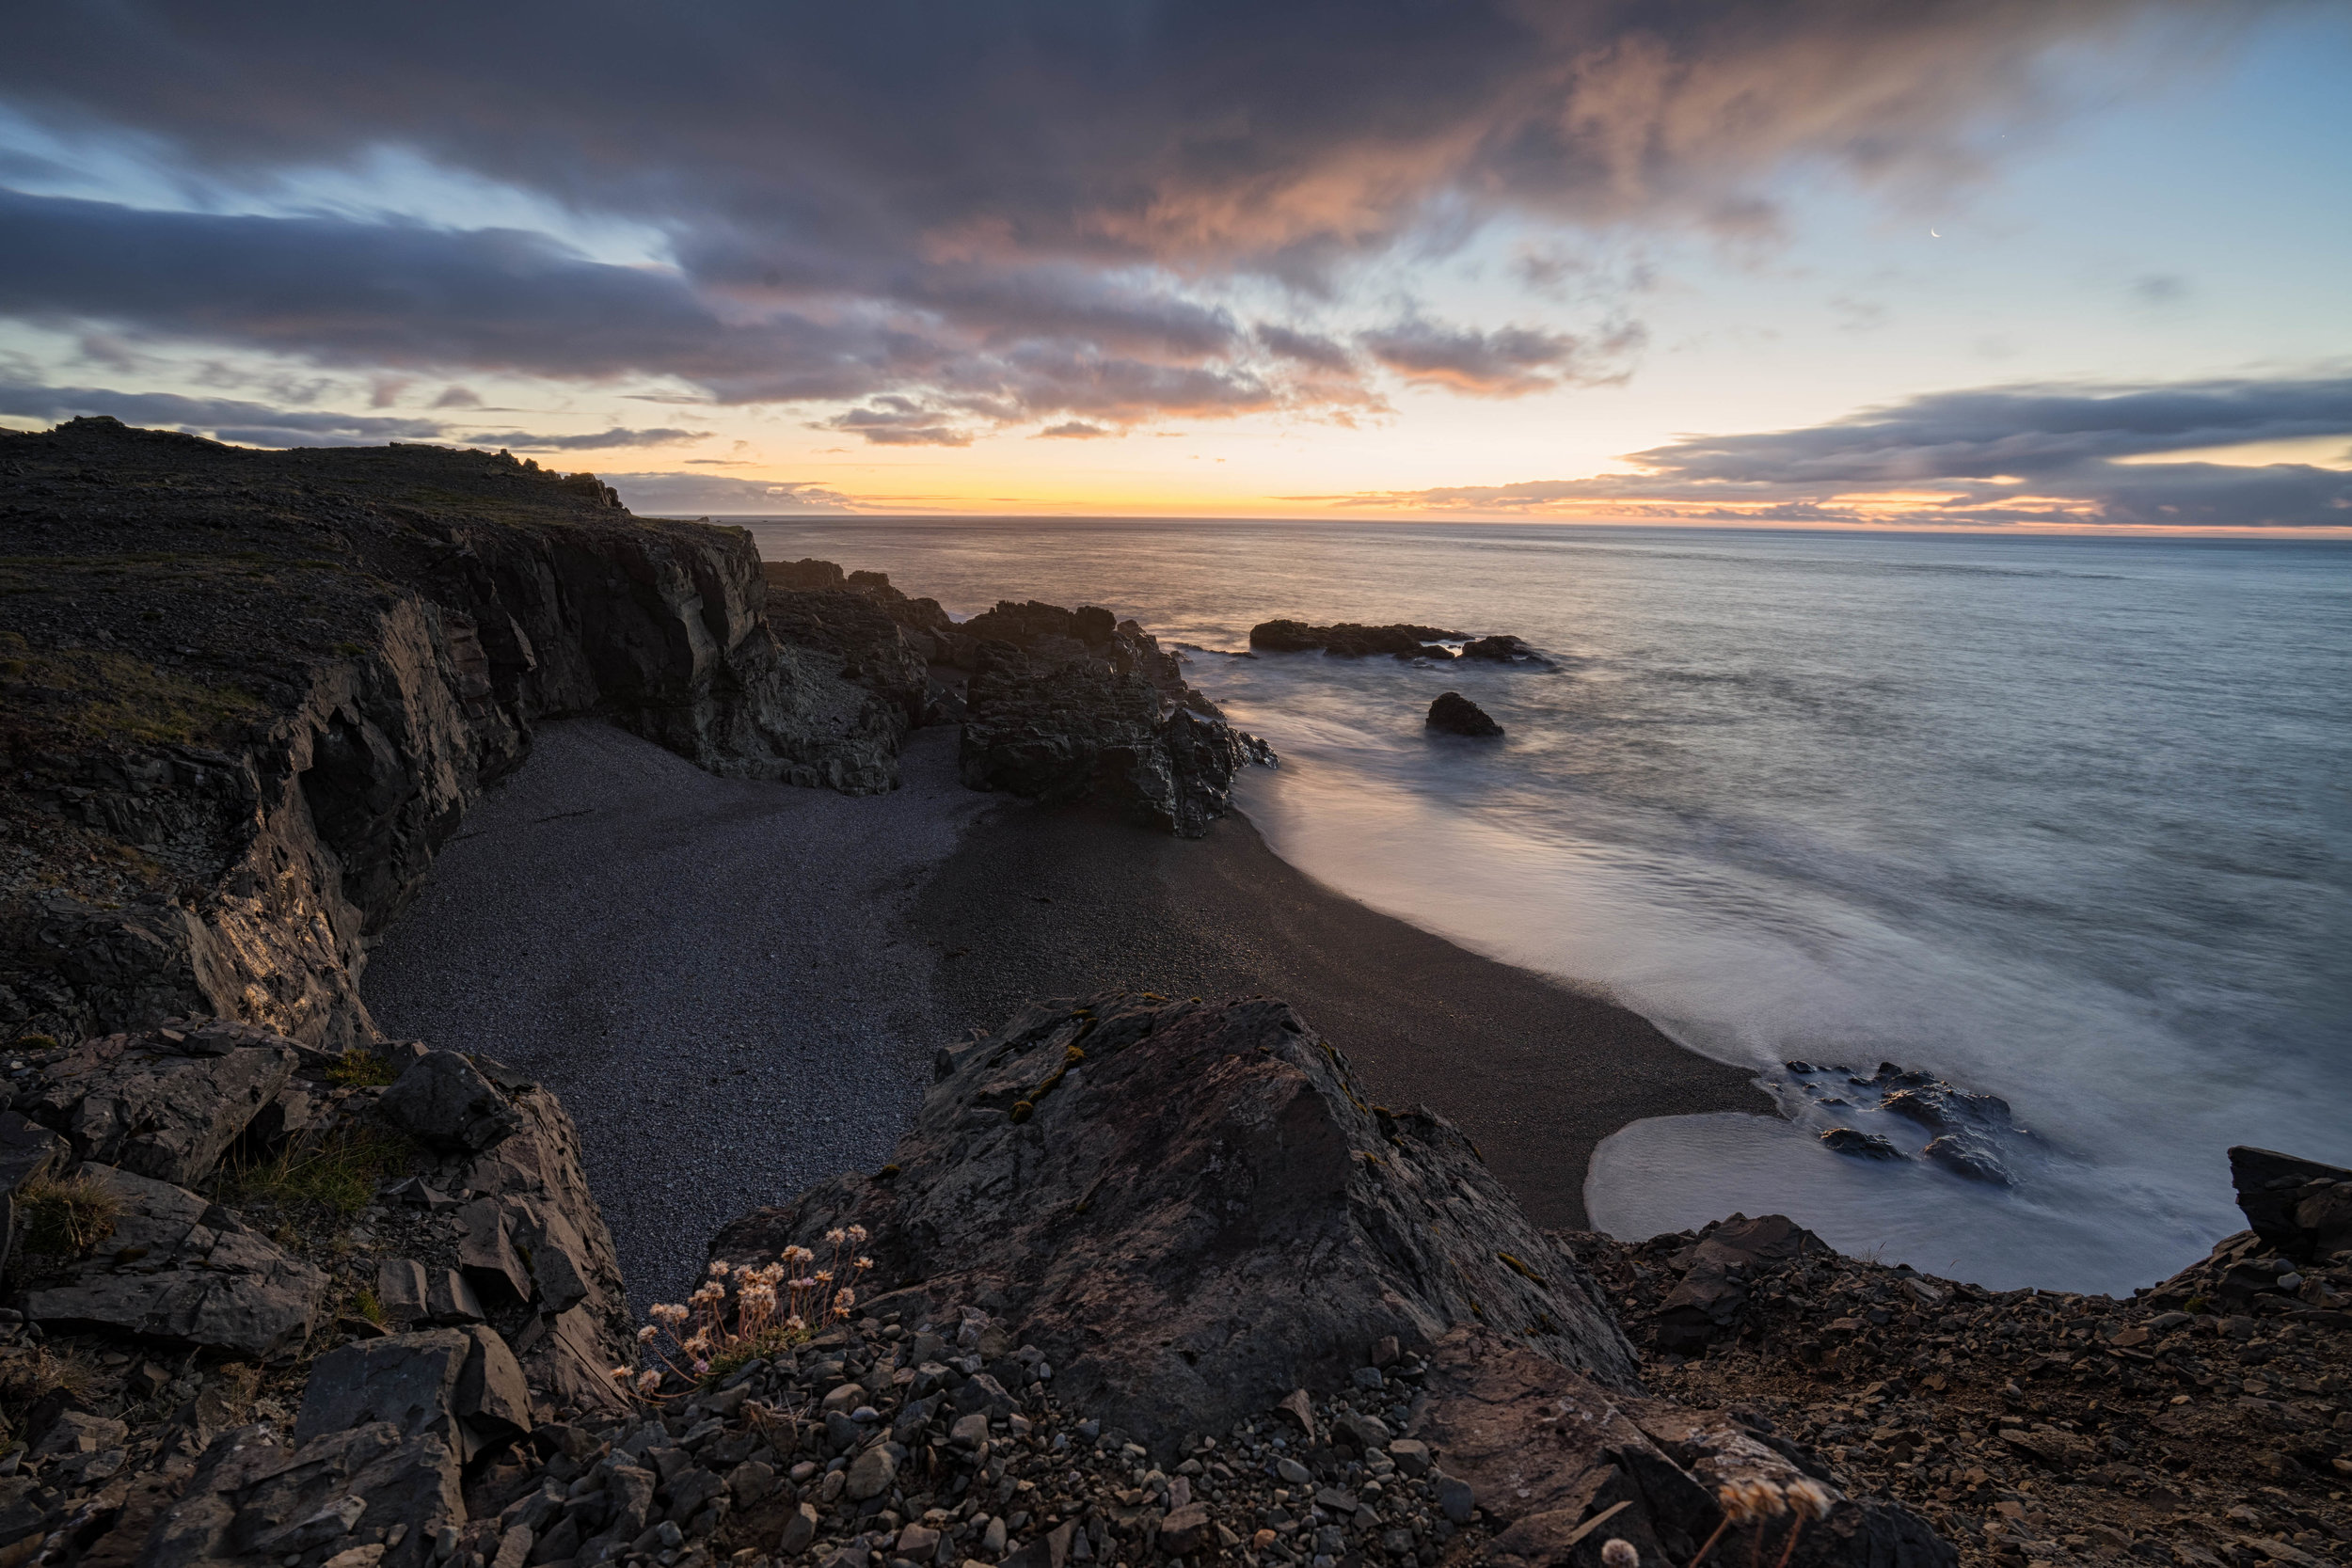 Iceland - 00608-2-HDR_ME-2 - Chris Goetchius 2017.jpg